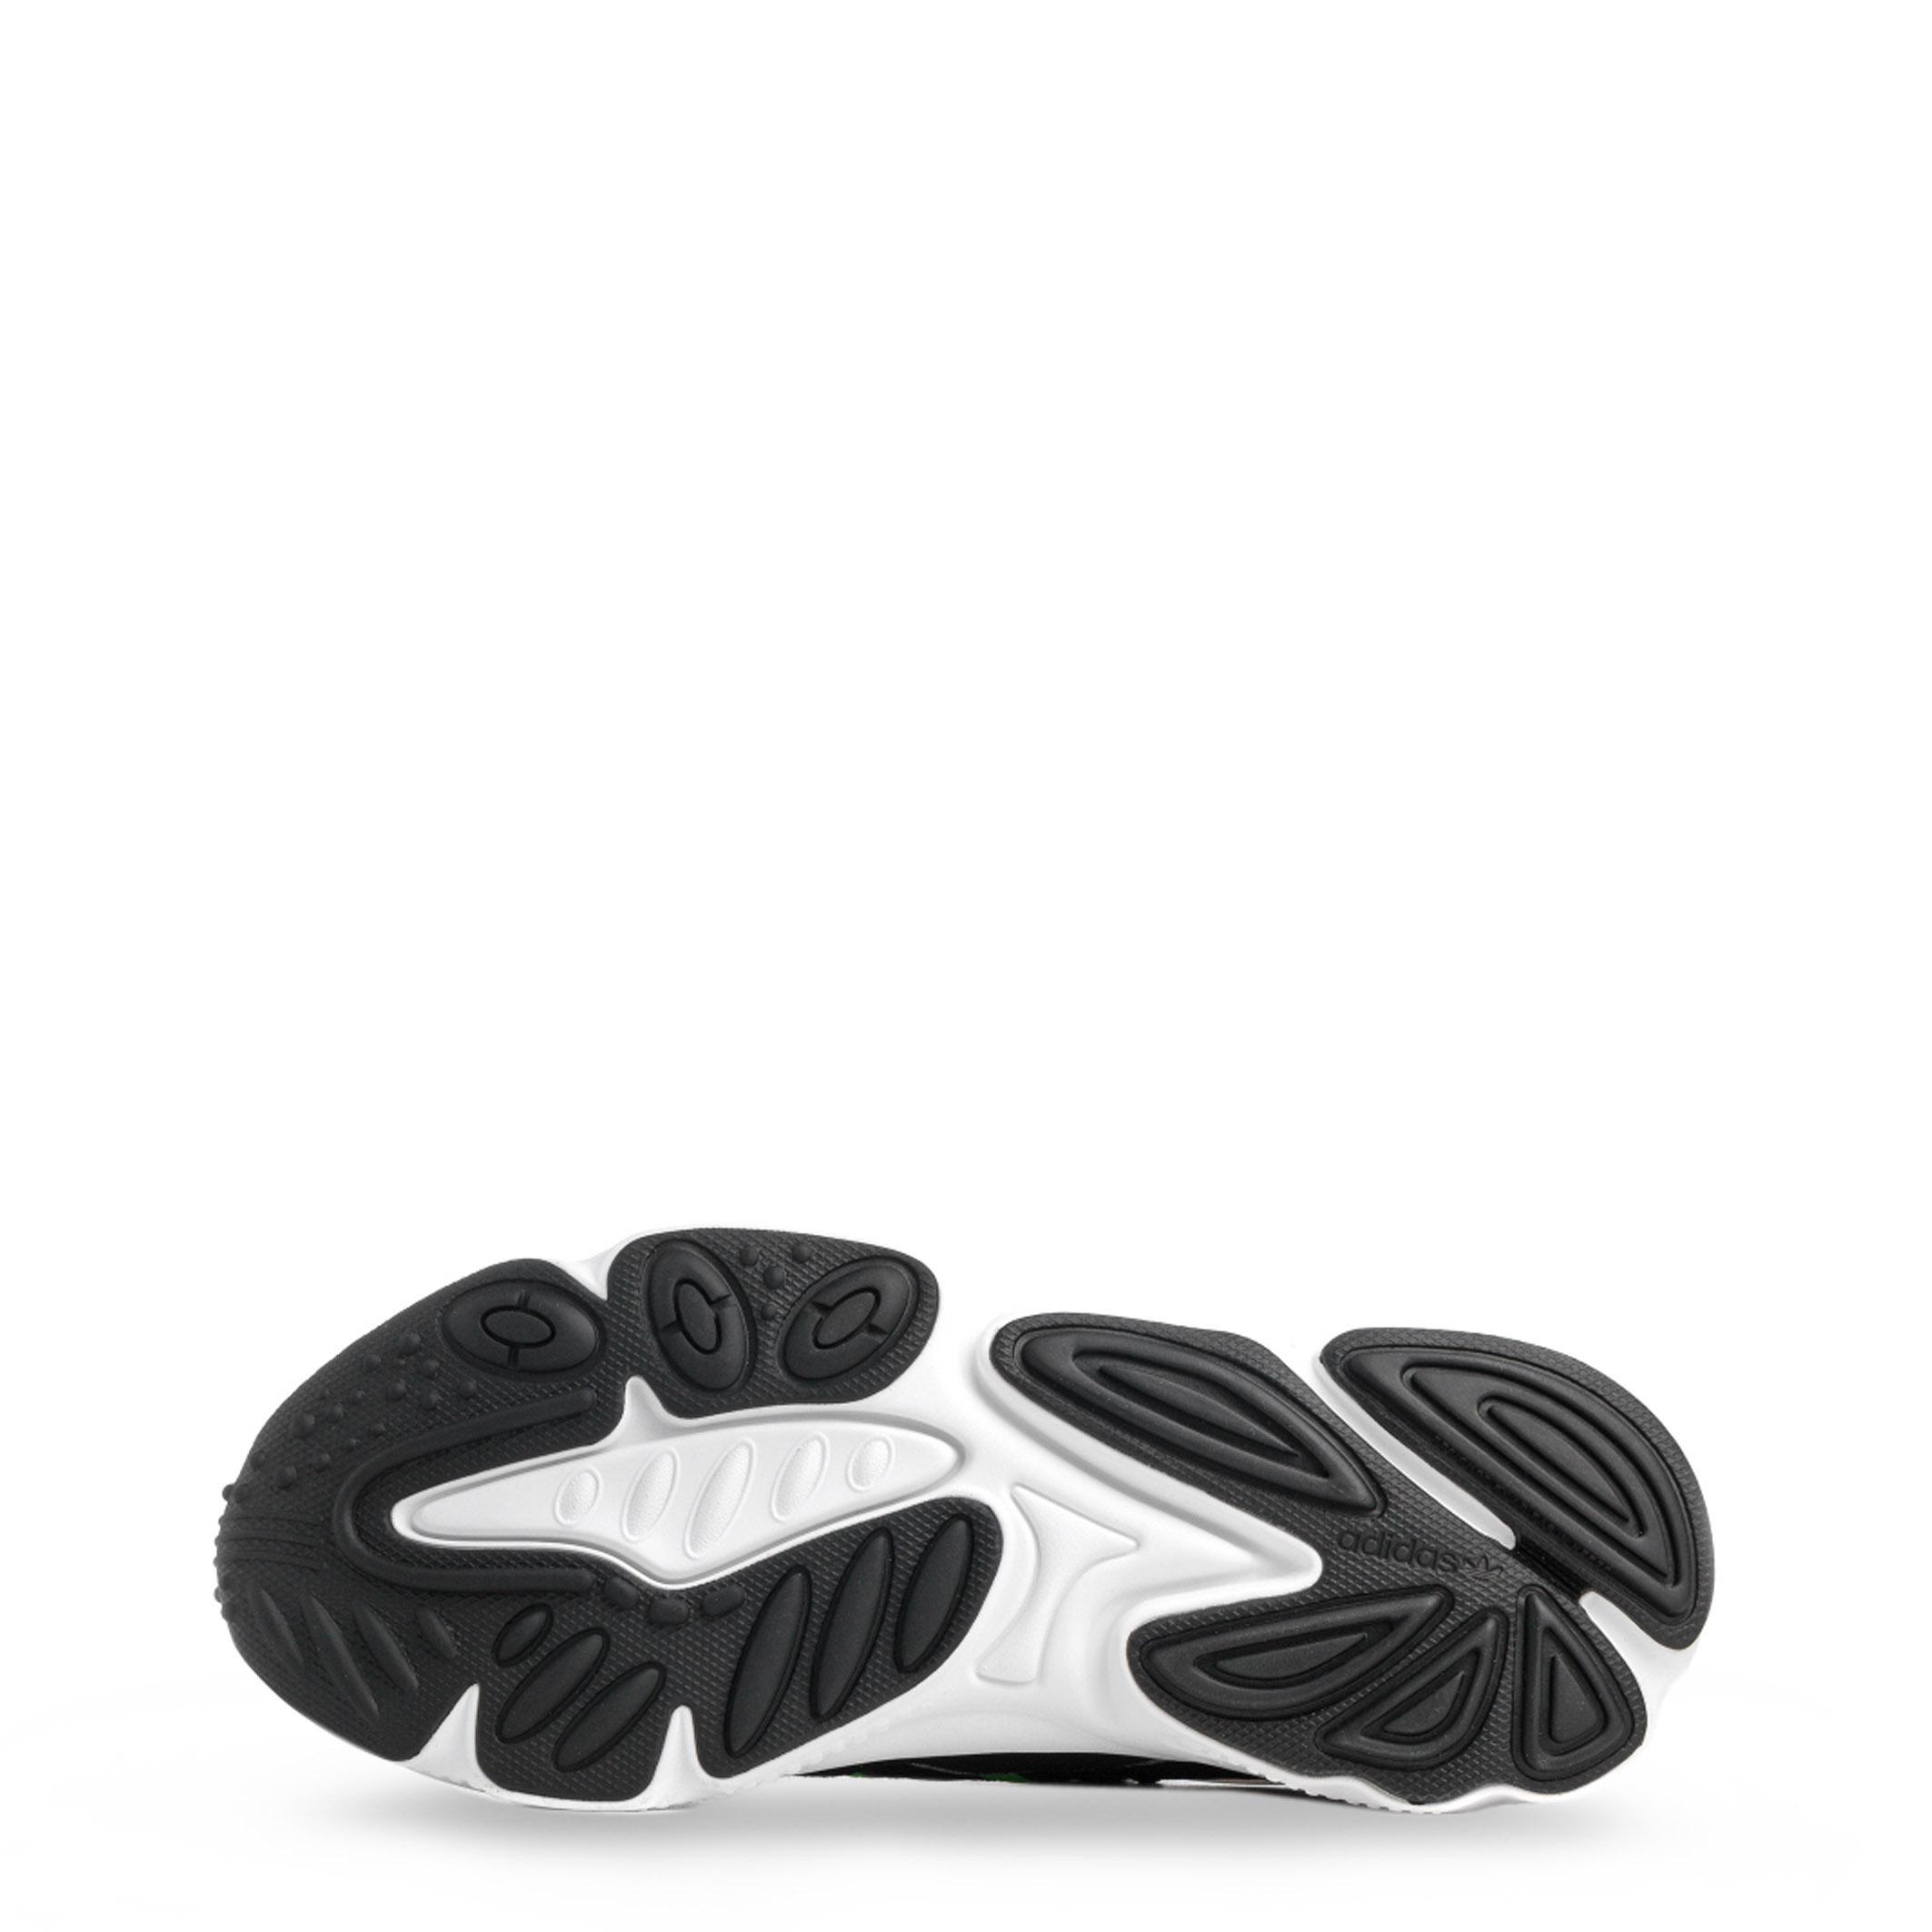 Baskets / Sport  Adidas EE7002_Ozweego black